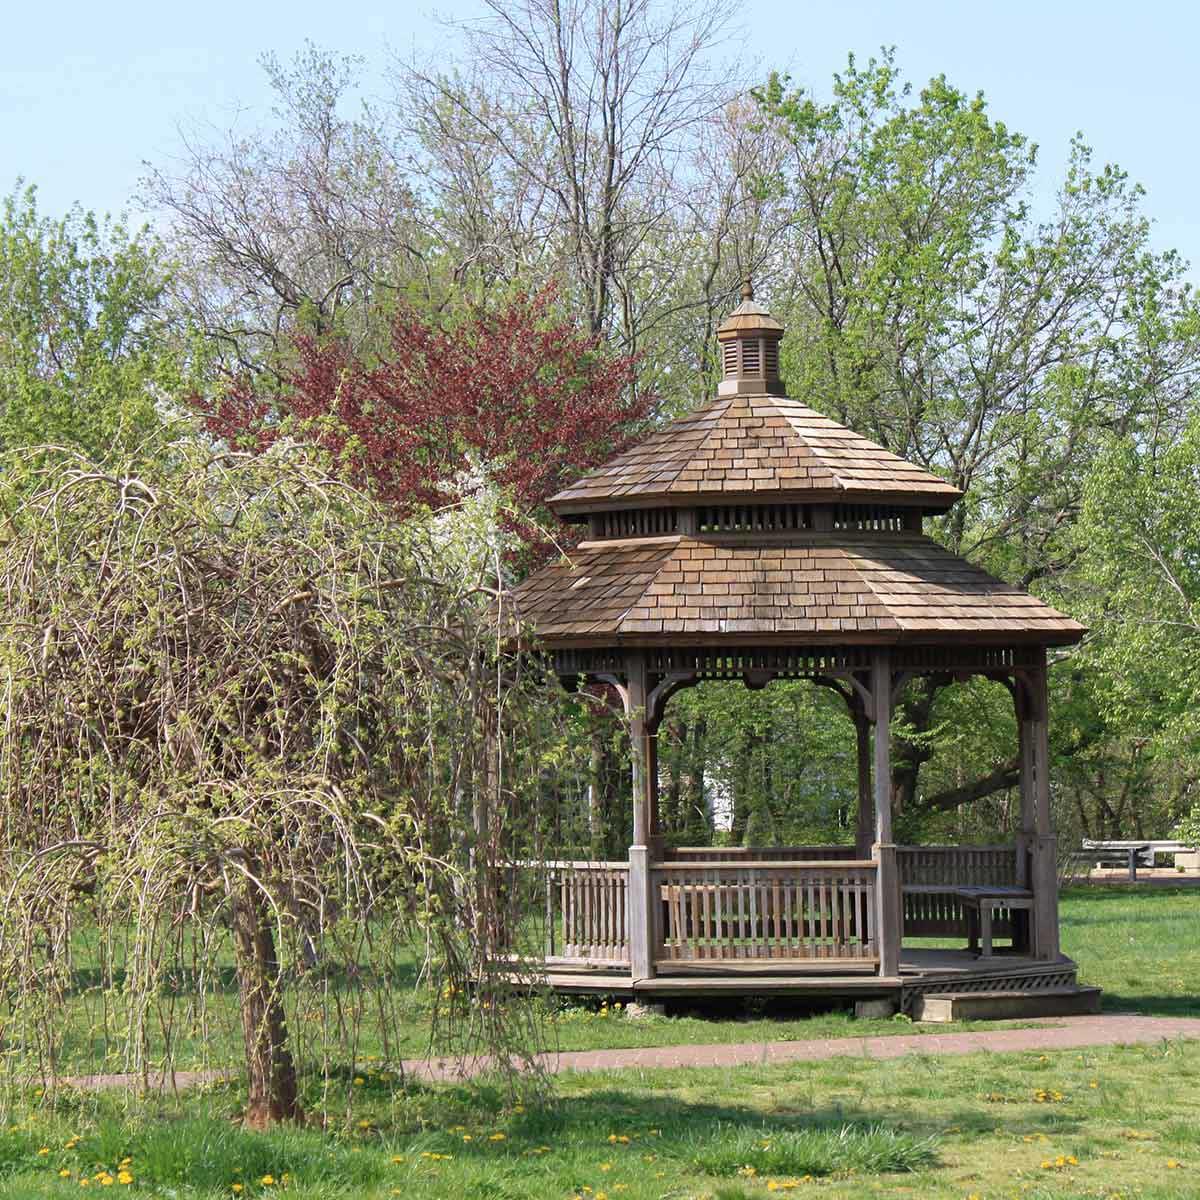 Relax in a gazebo at Laurel Acres Park near Mount Laurel, NJ.